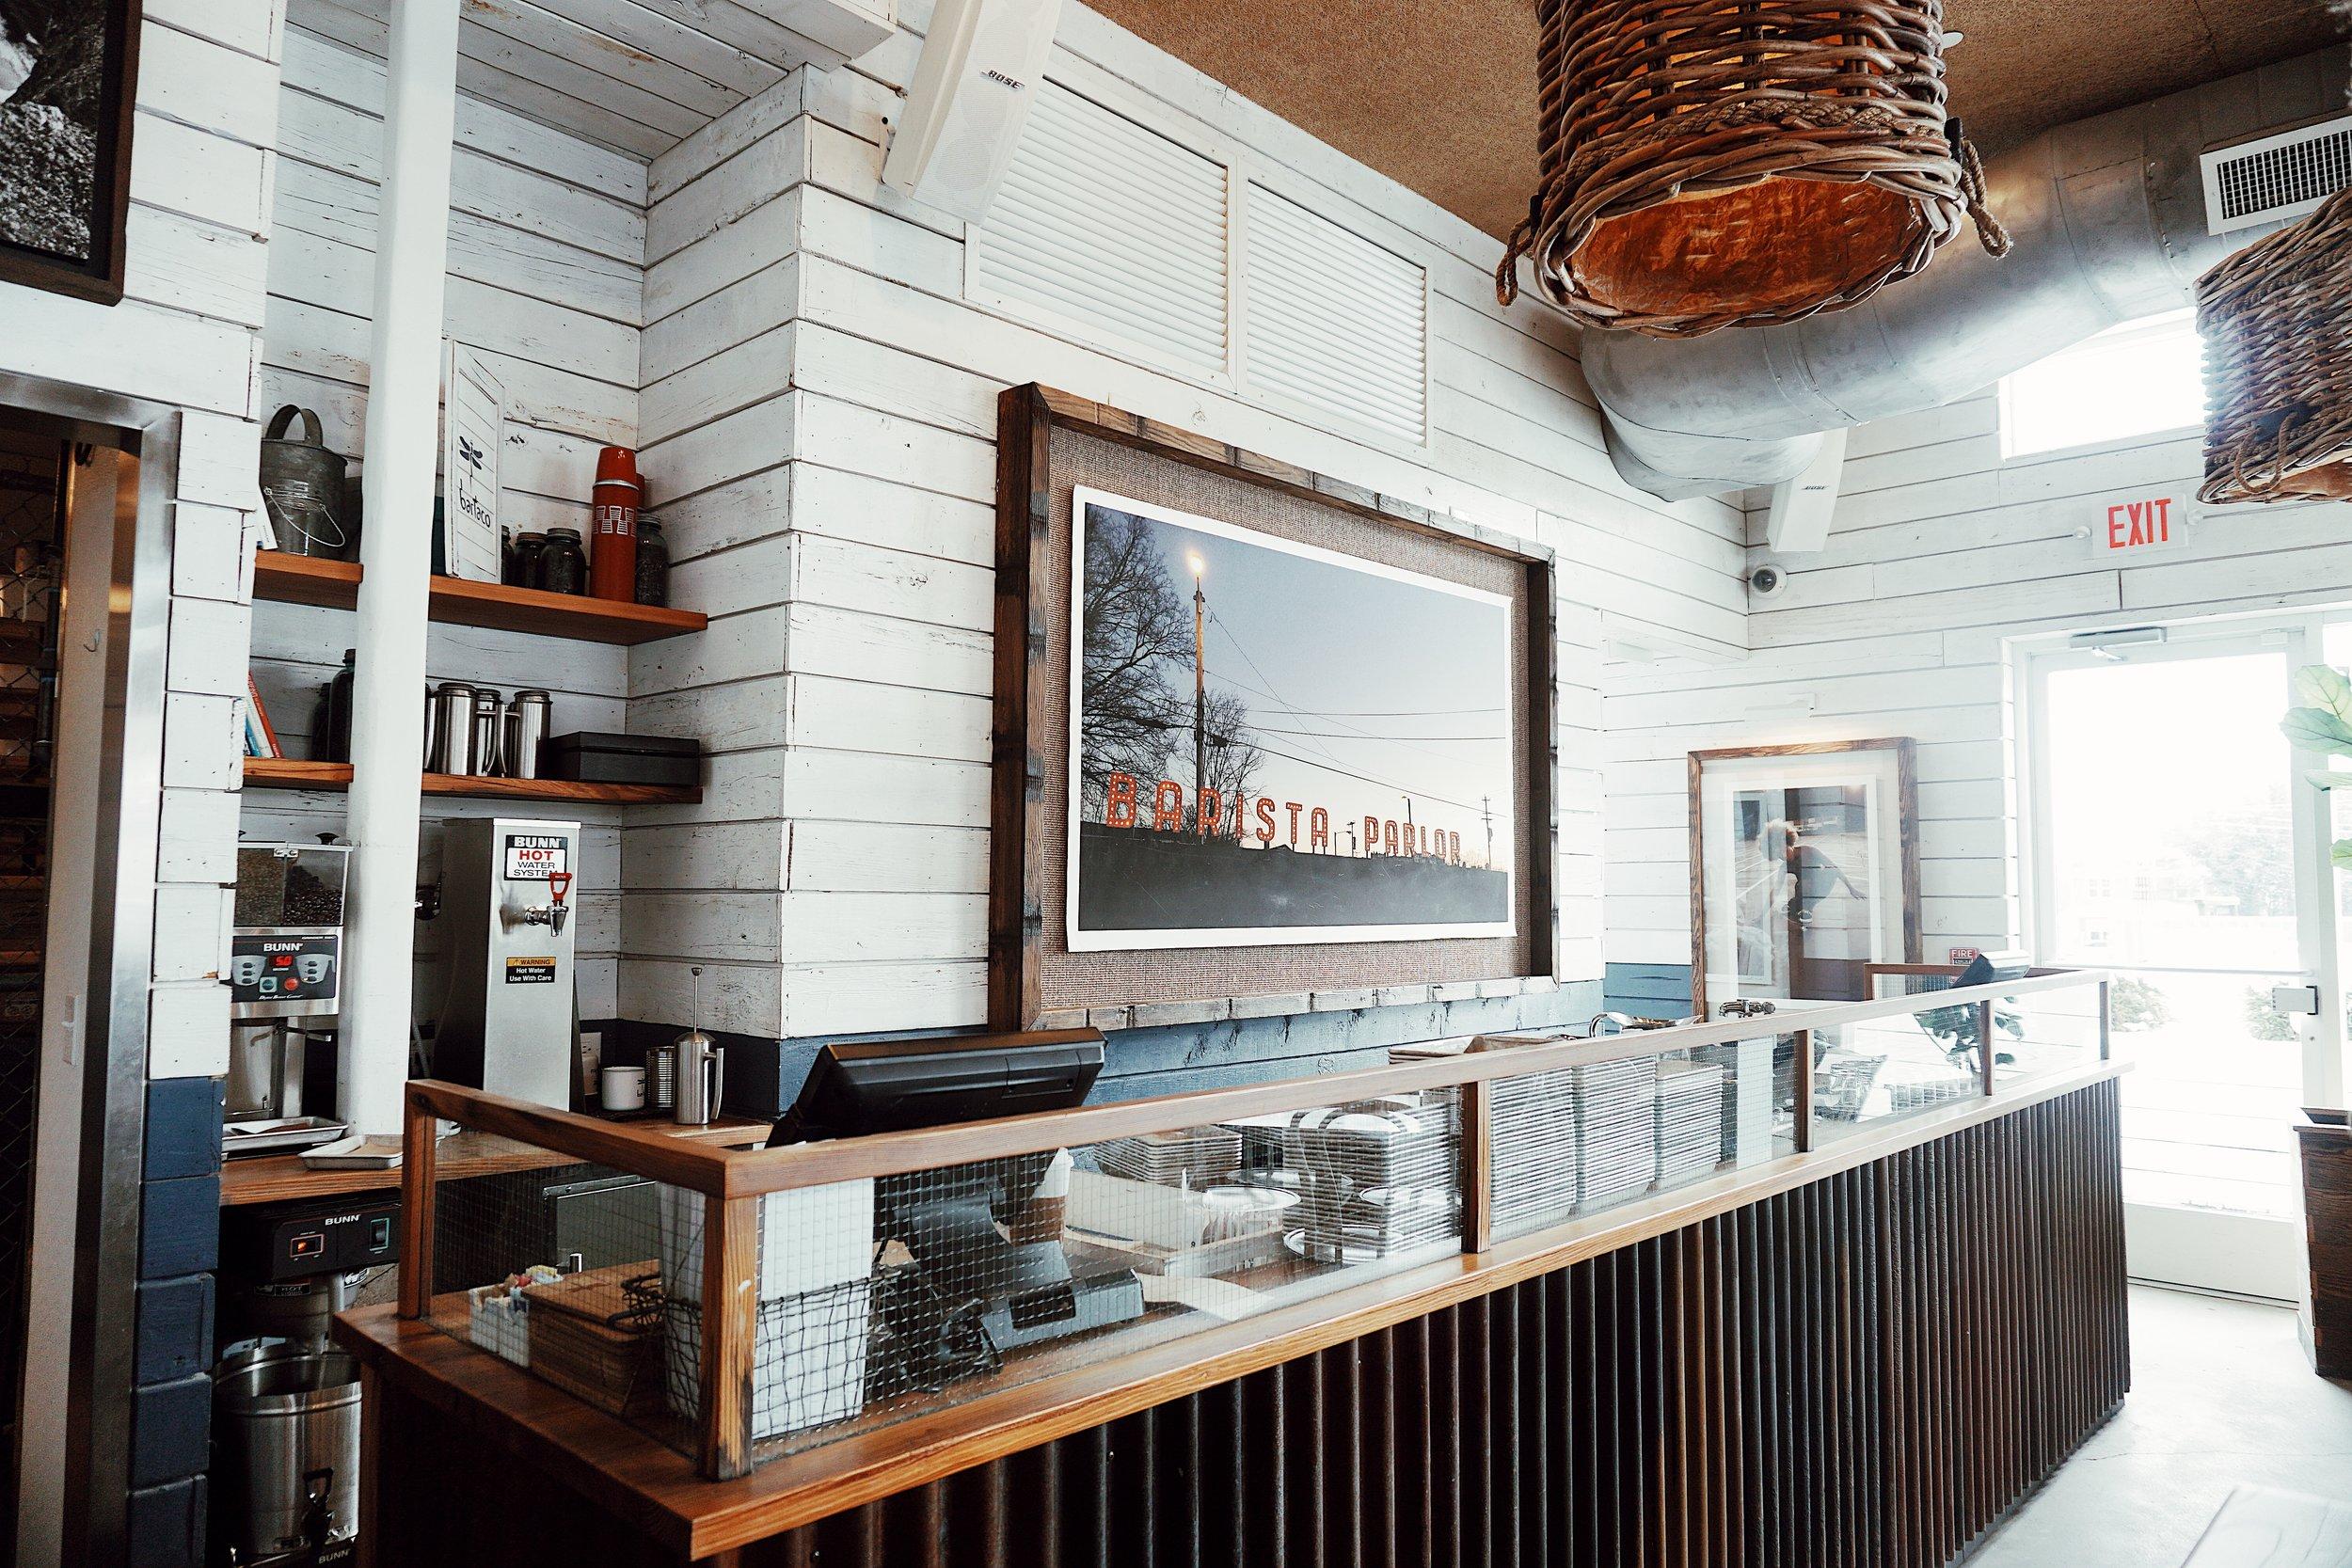 bar-taco-decor-beach-nashville-tennessee-guide.jpg